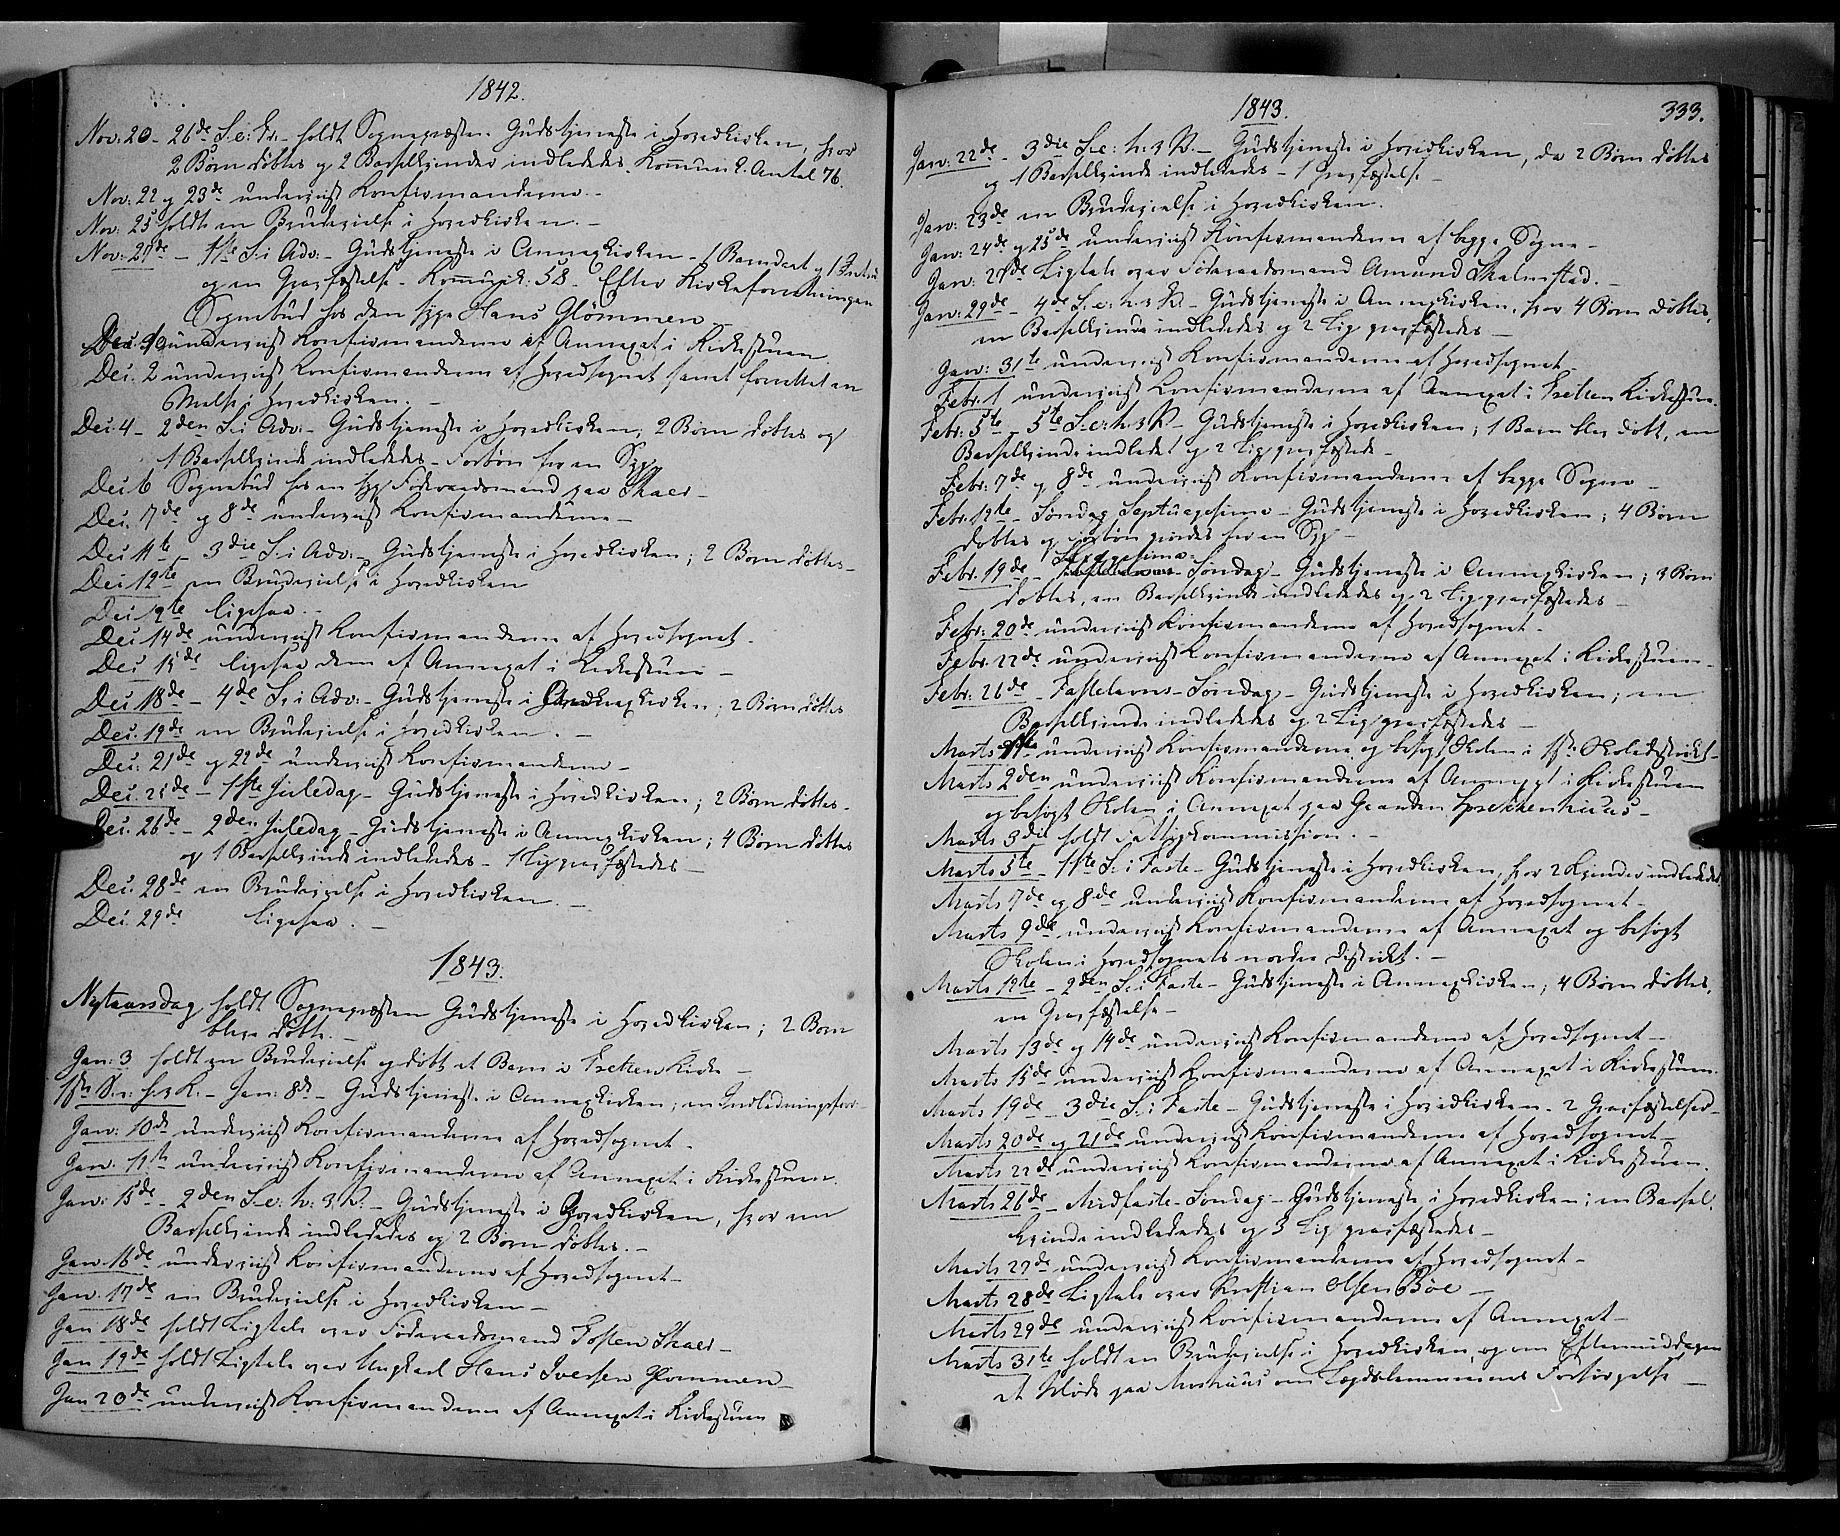 SAH, Øyer prestekontor, Ministerialbok nr. 5, 1842-1857, s. 333